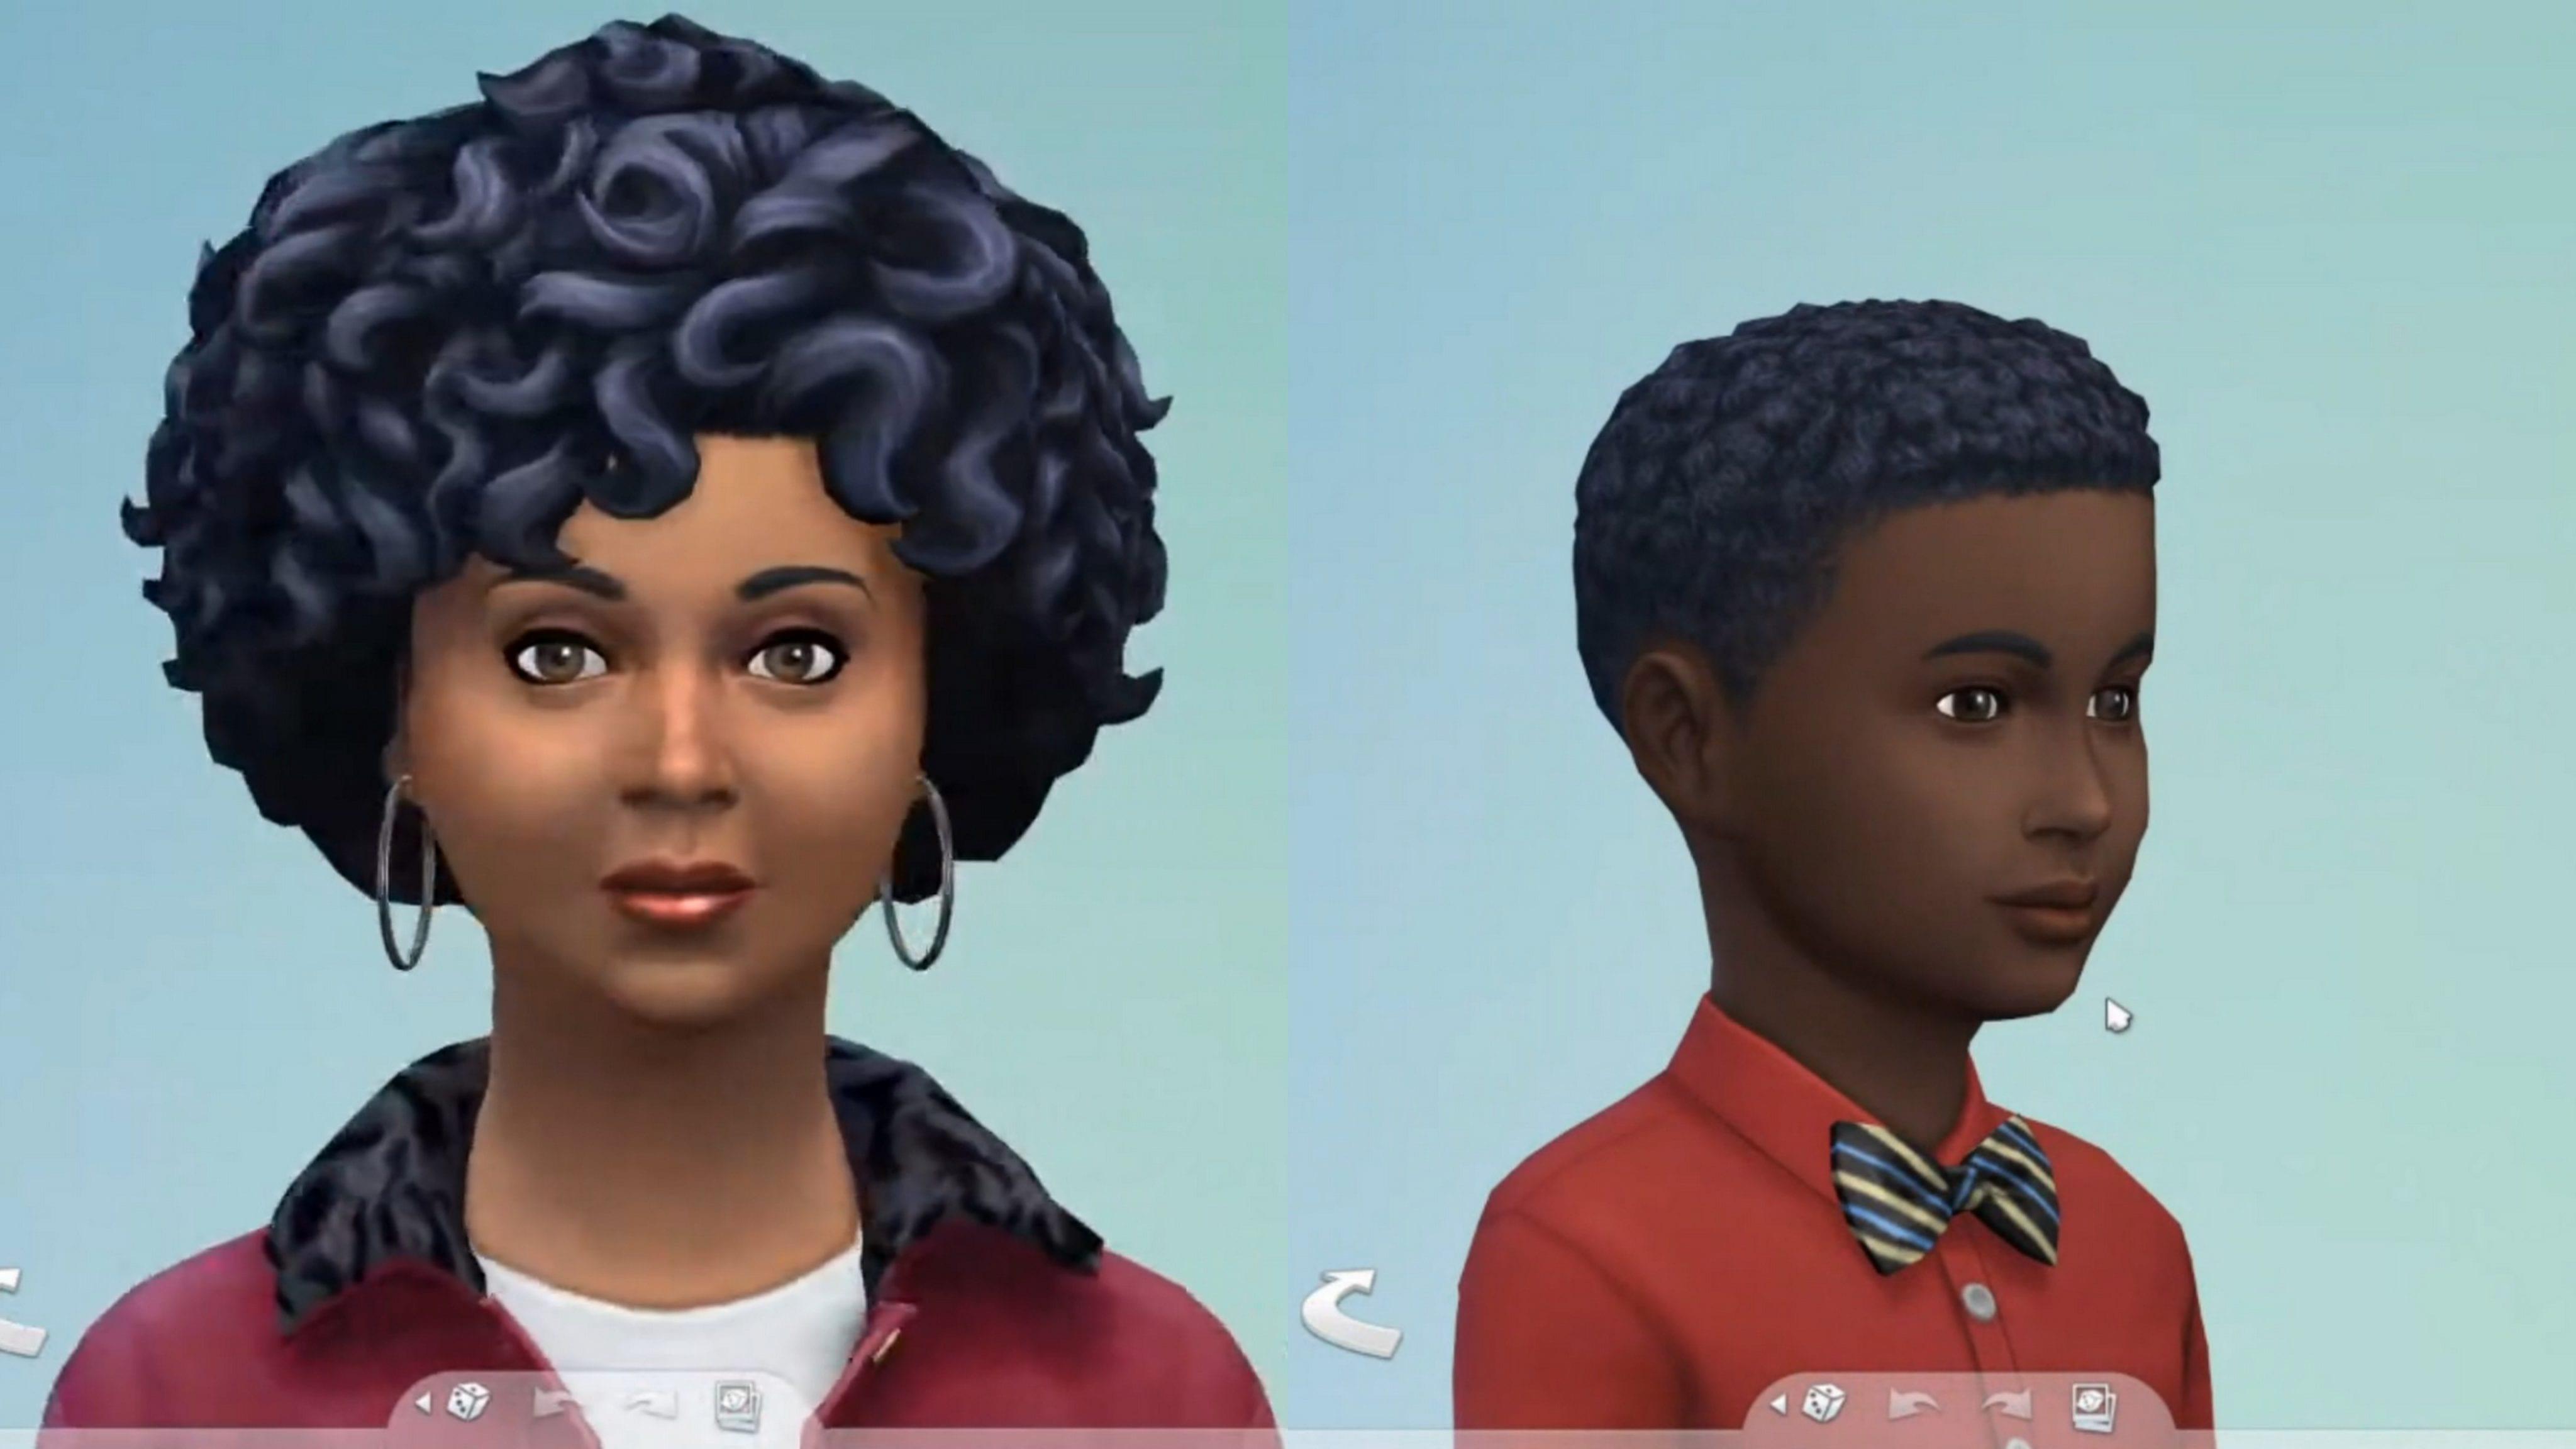 Sims 4 Frisuren Afro